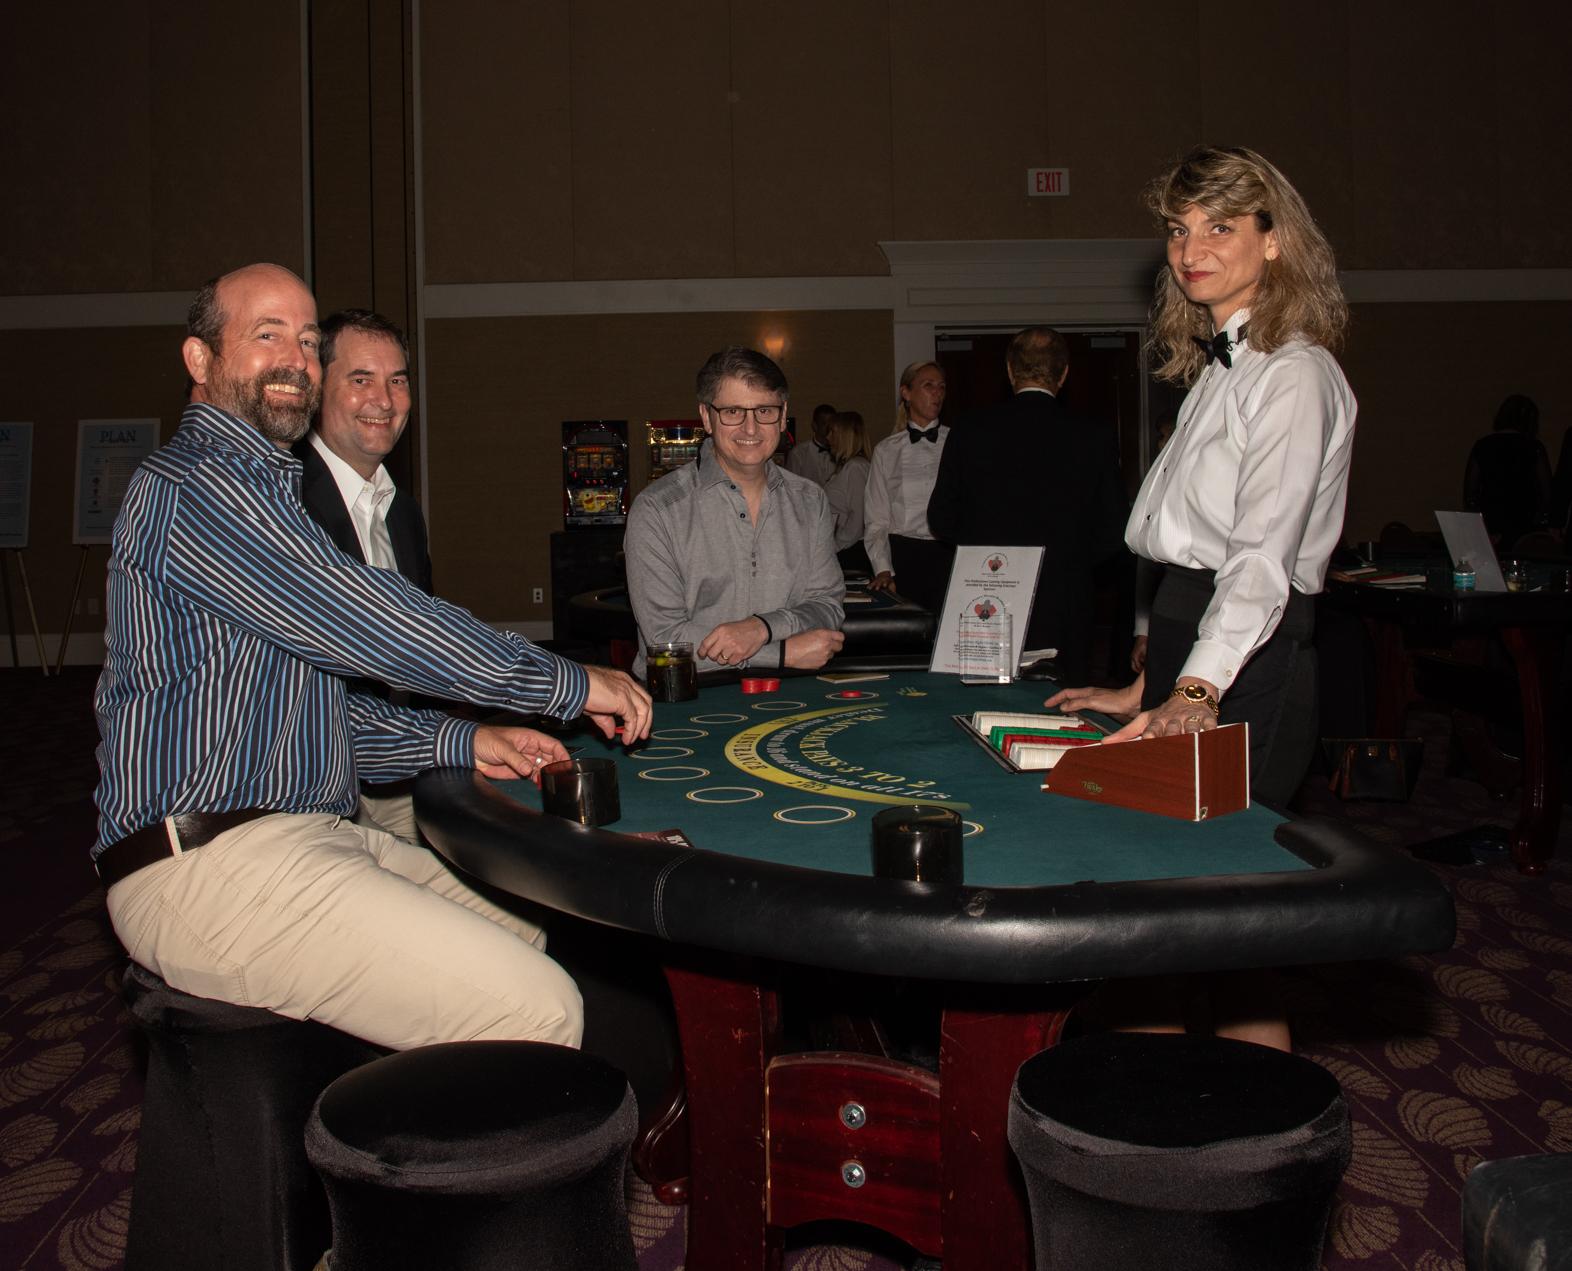 naples residents enjoying themselves at a blackjack table